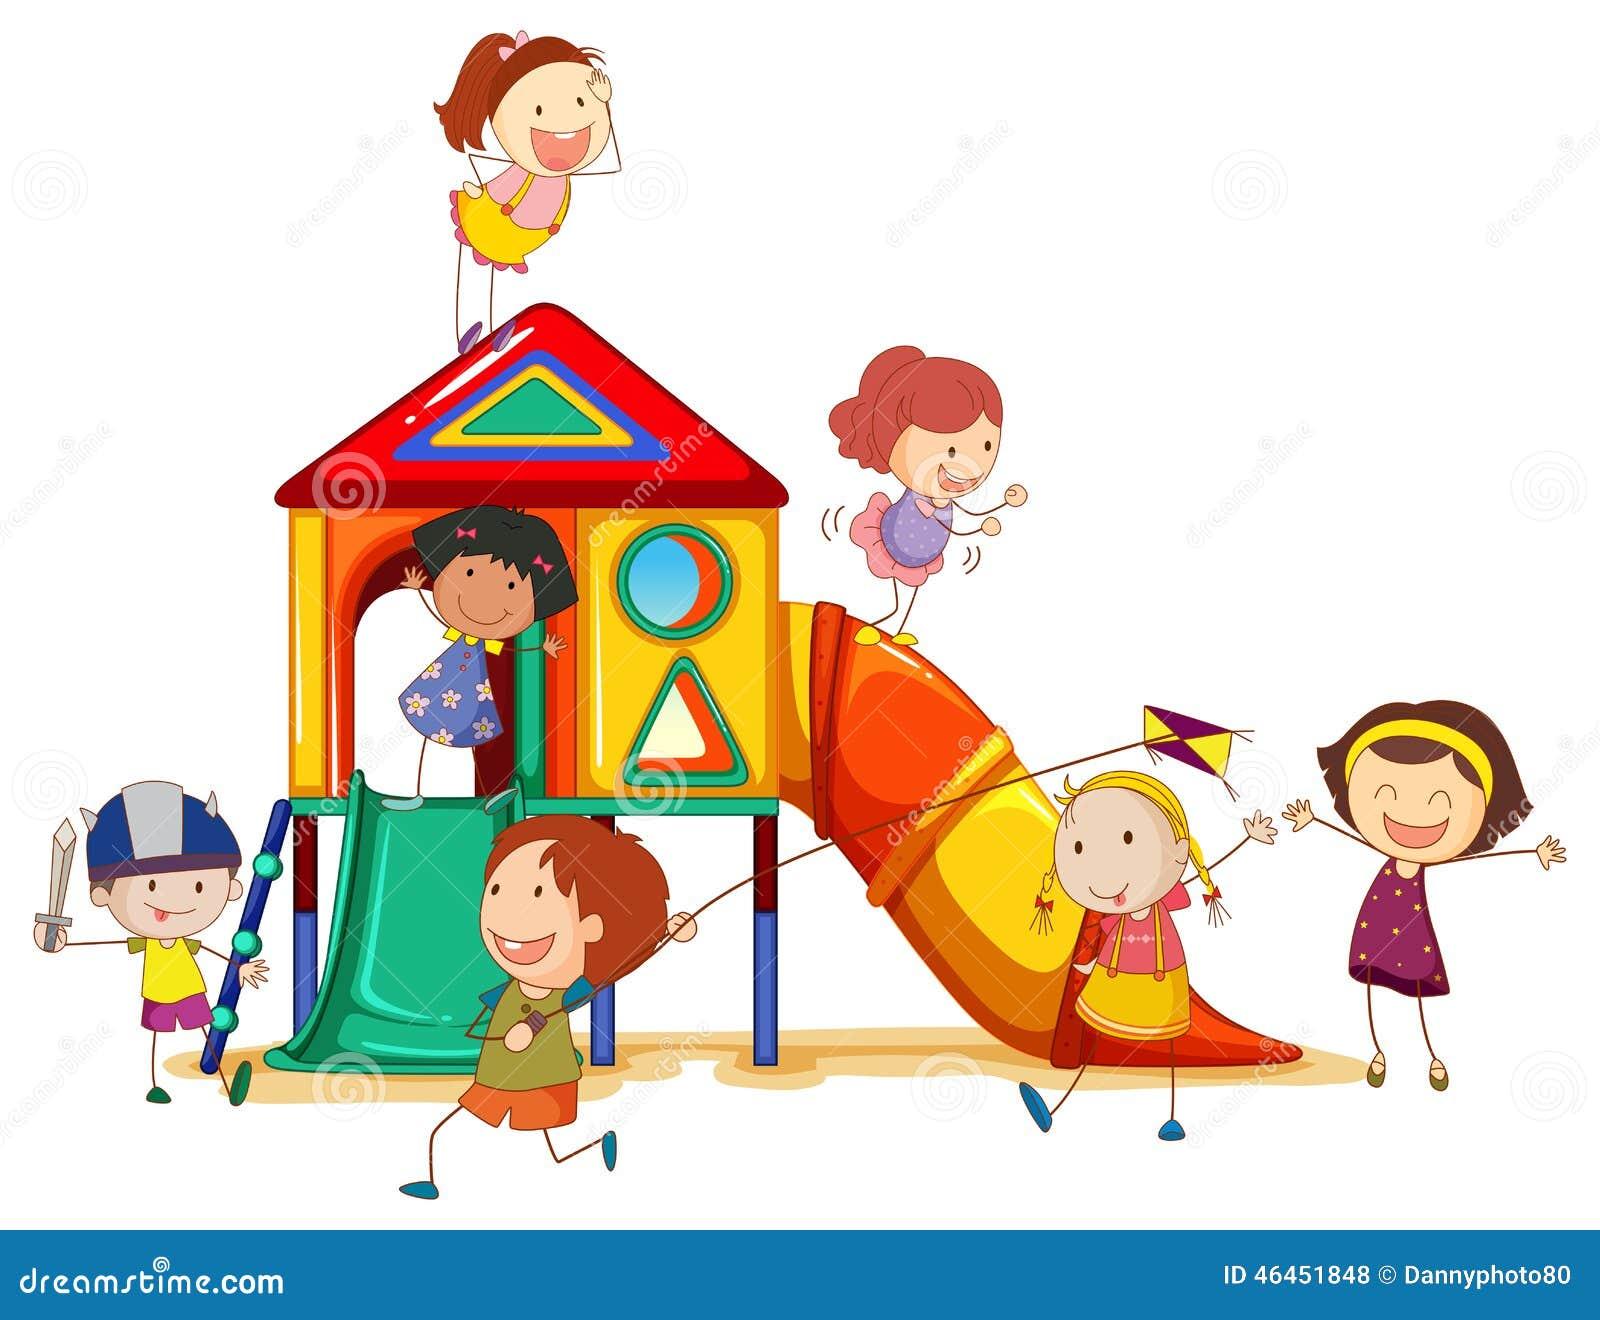 Children playing stock vector. Illustration of plastic ...